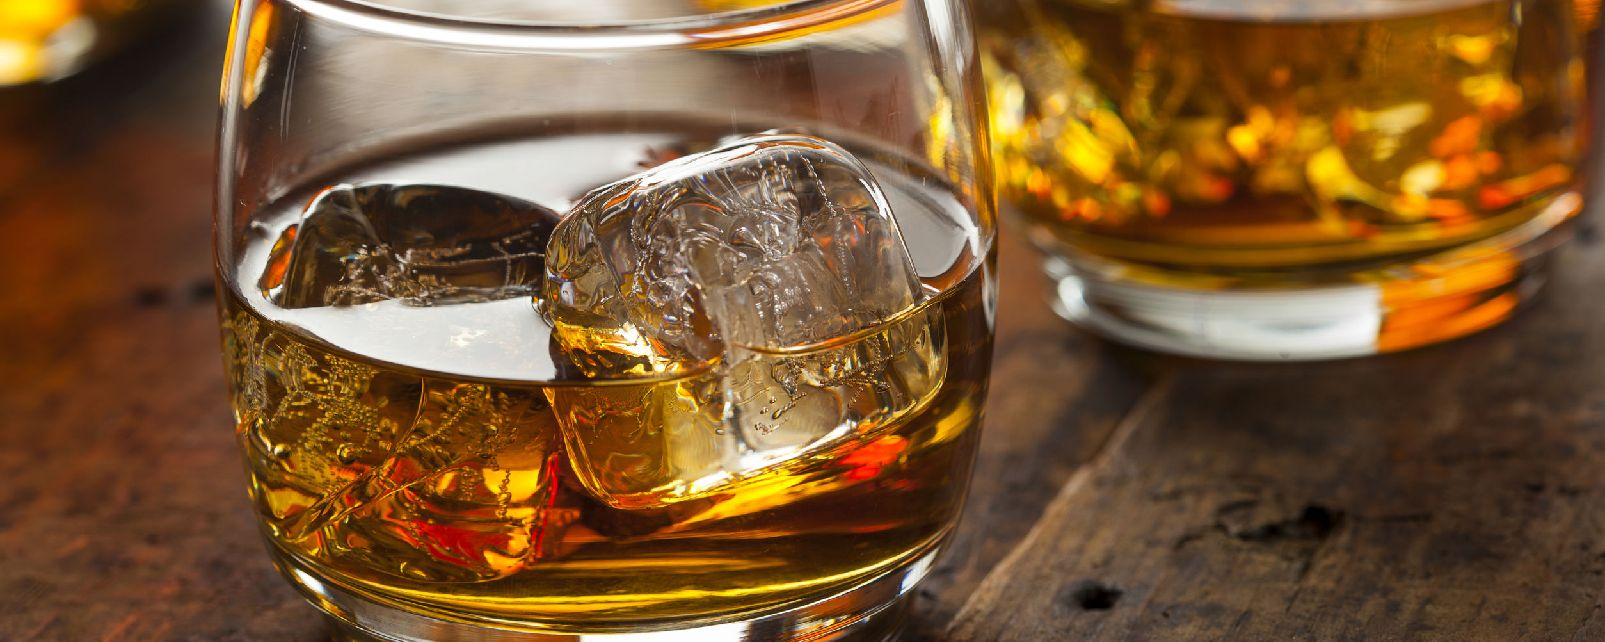 El bourbon de Kentucky , Estados Unidos